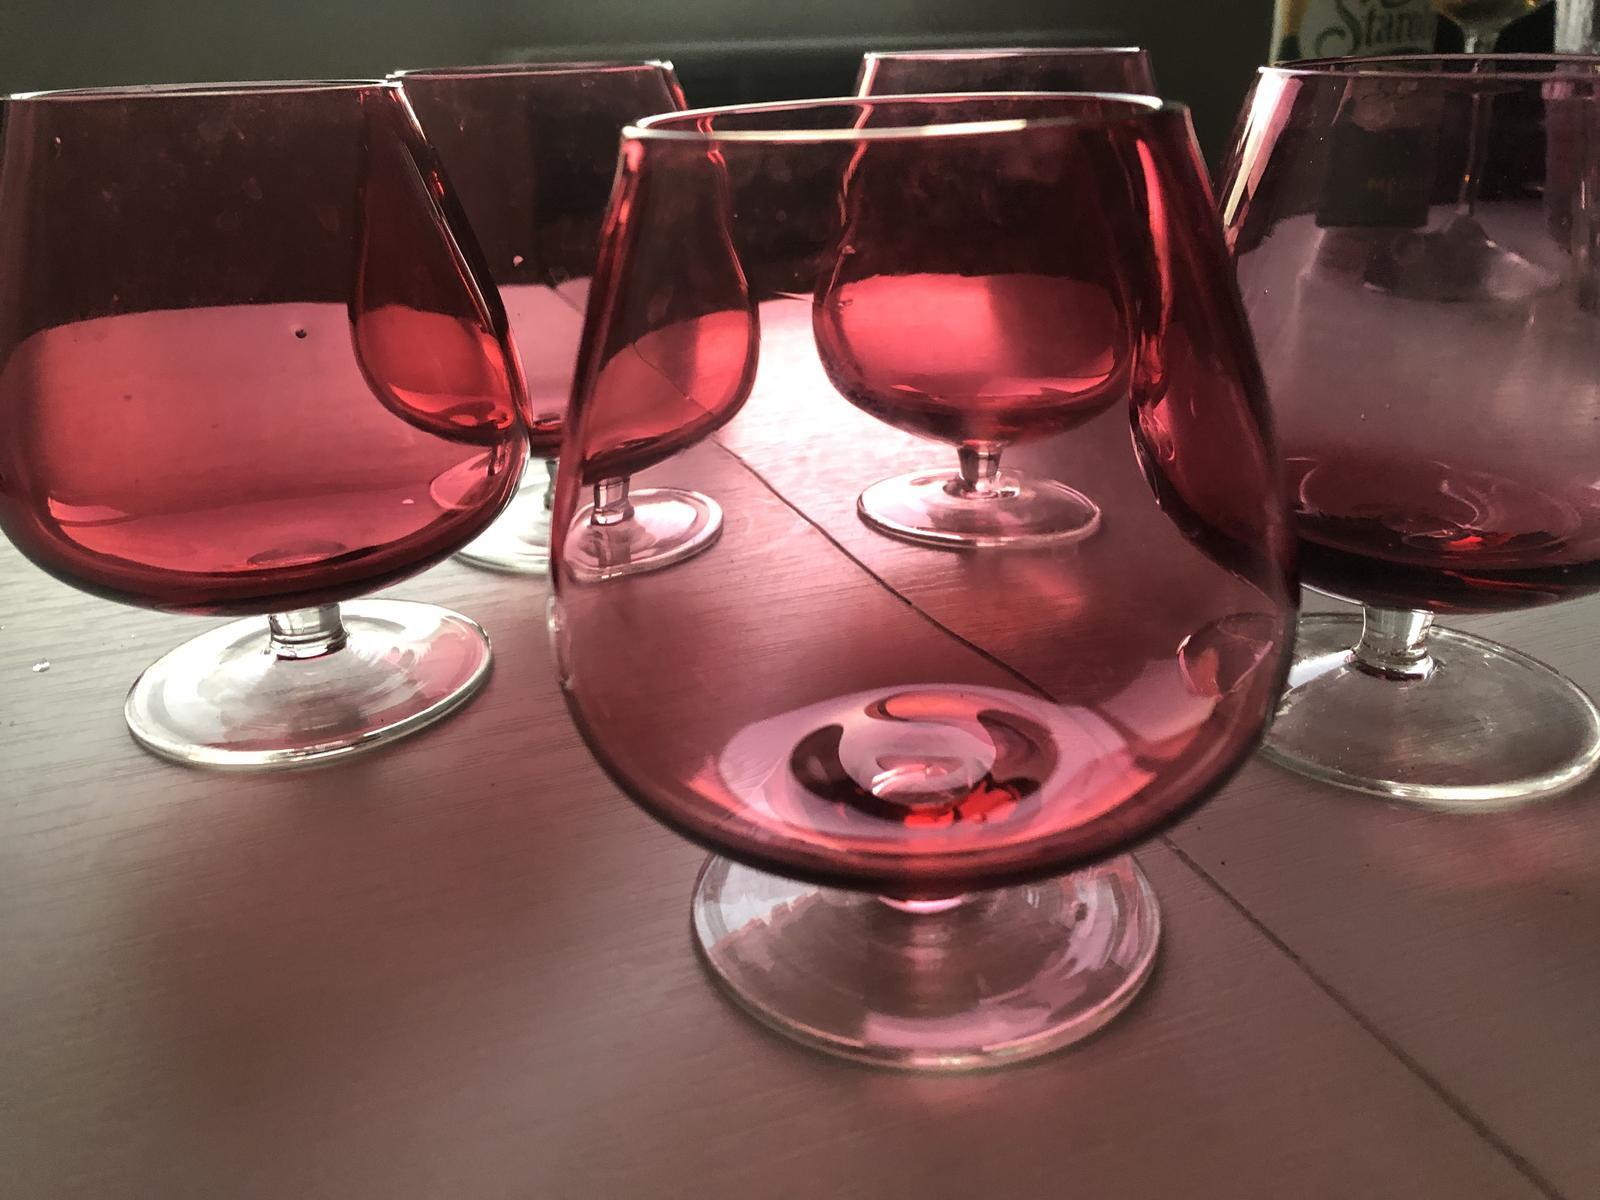 Růžové skleničky 🍸💞 - Obrázek č. 1